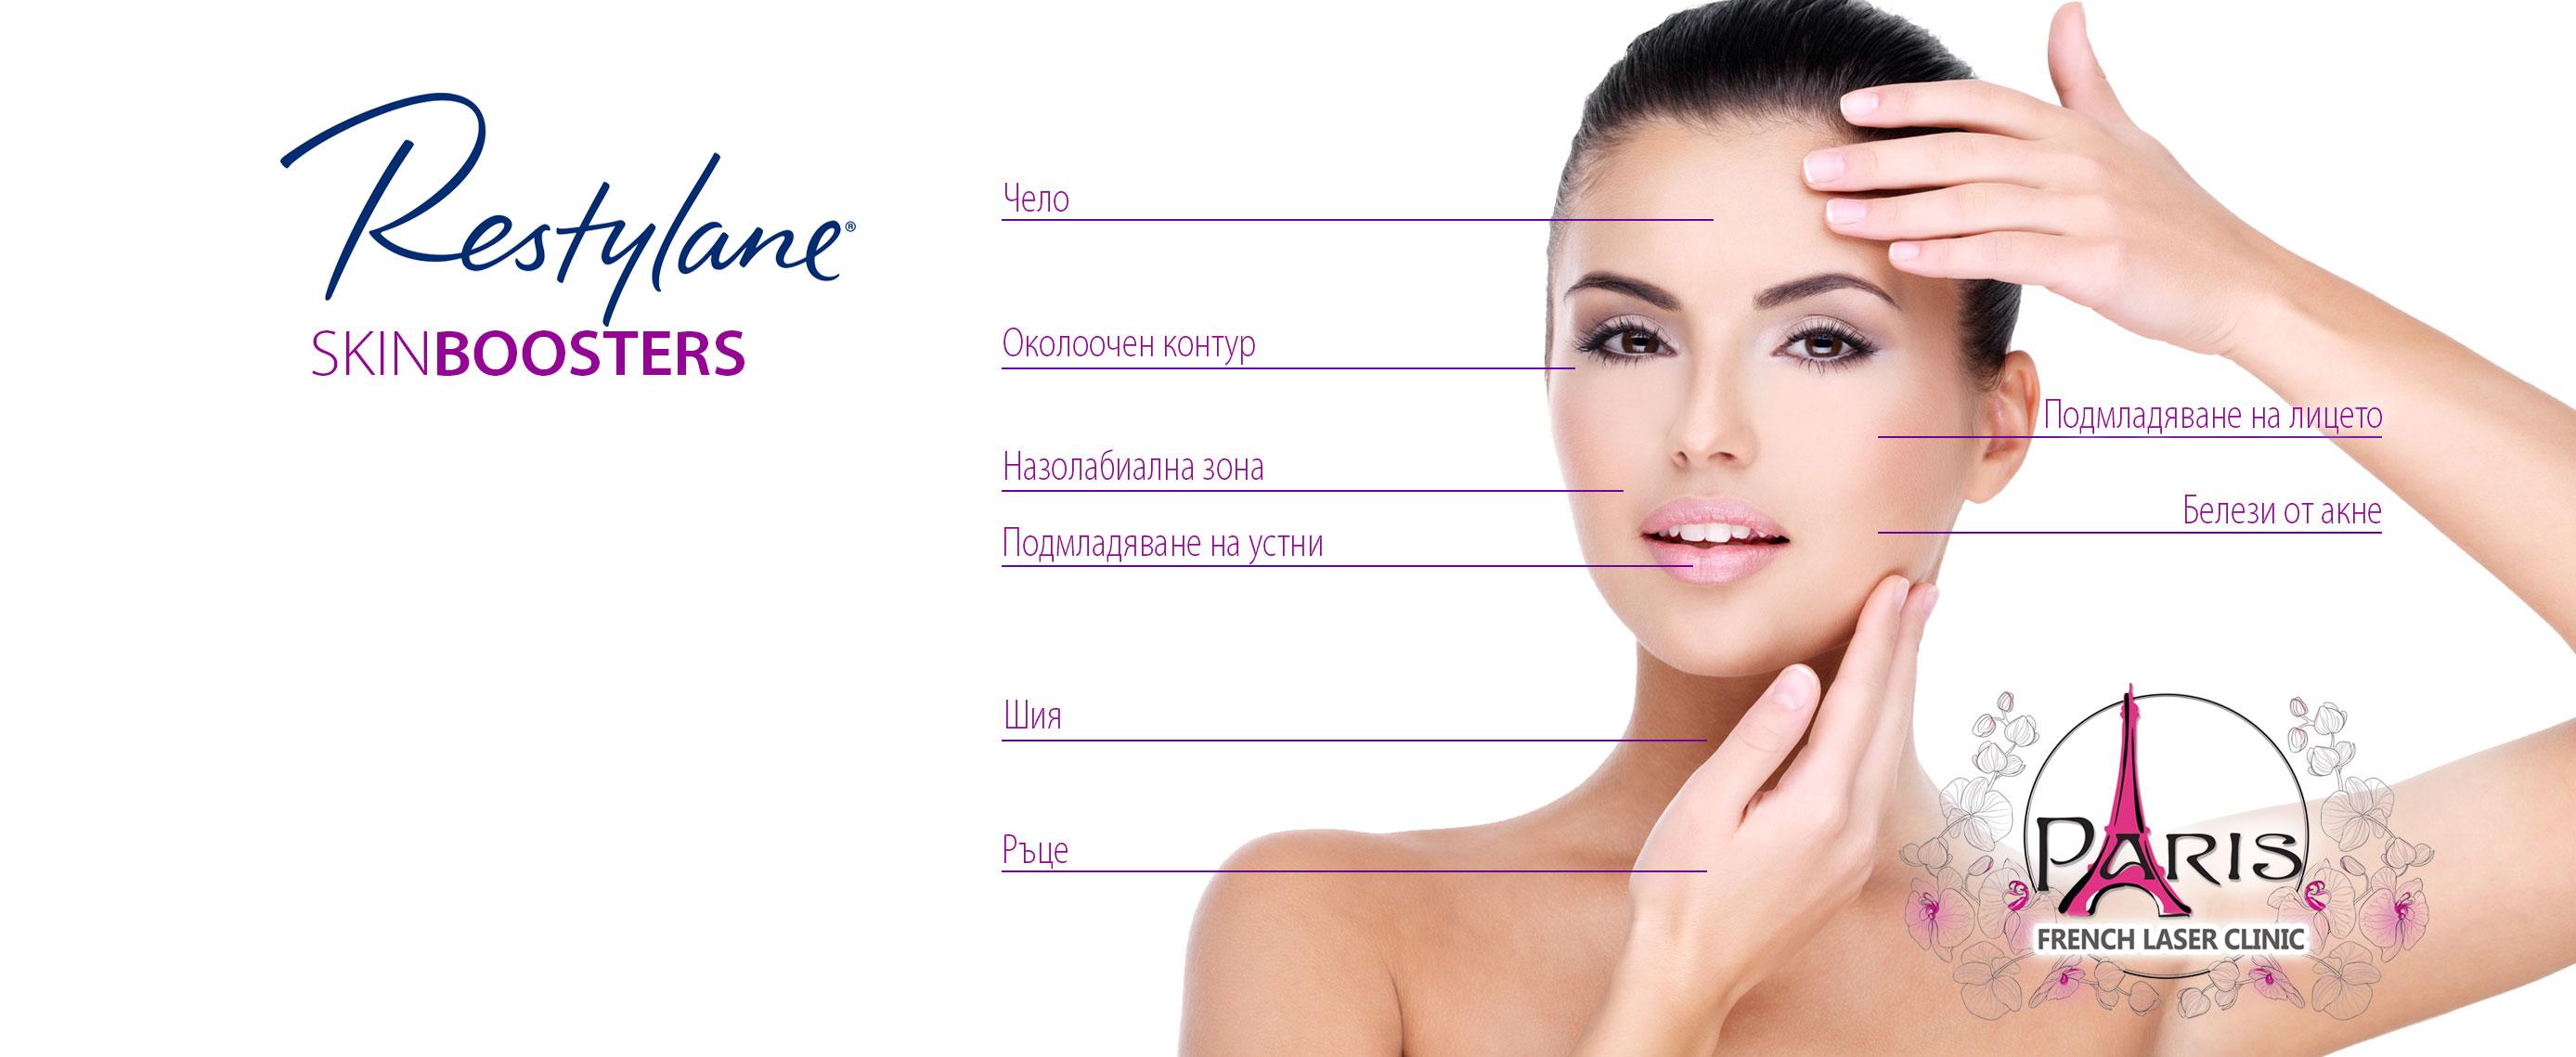 SkinBoosters от Restylane - Мезотерапия